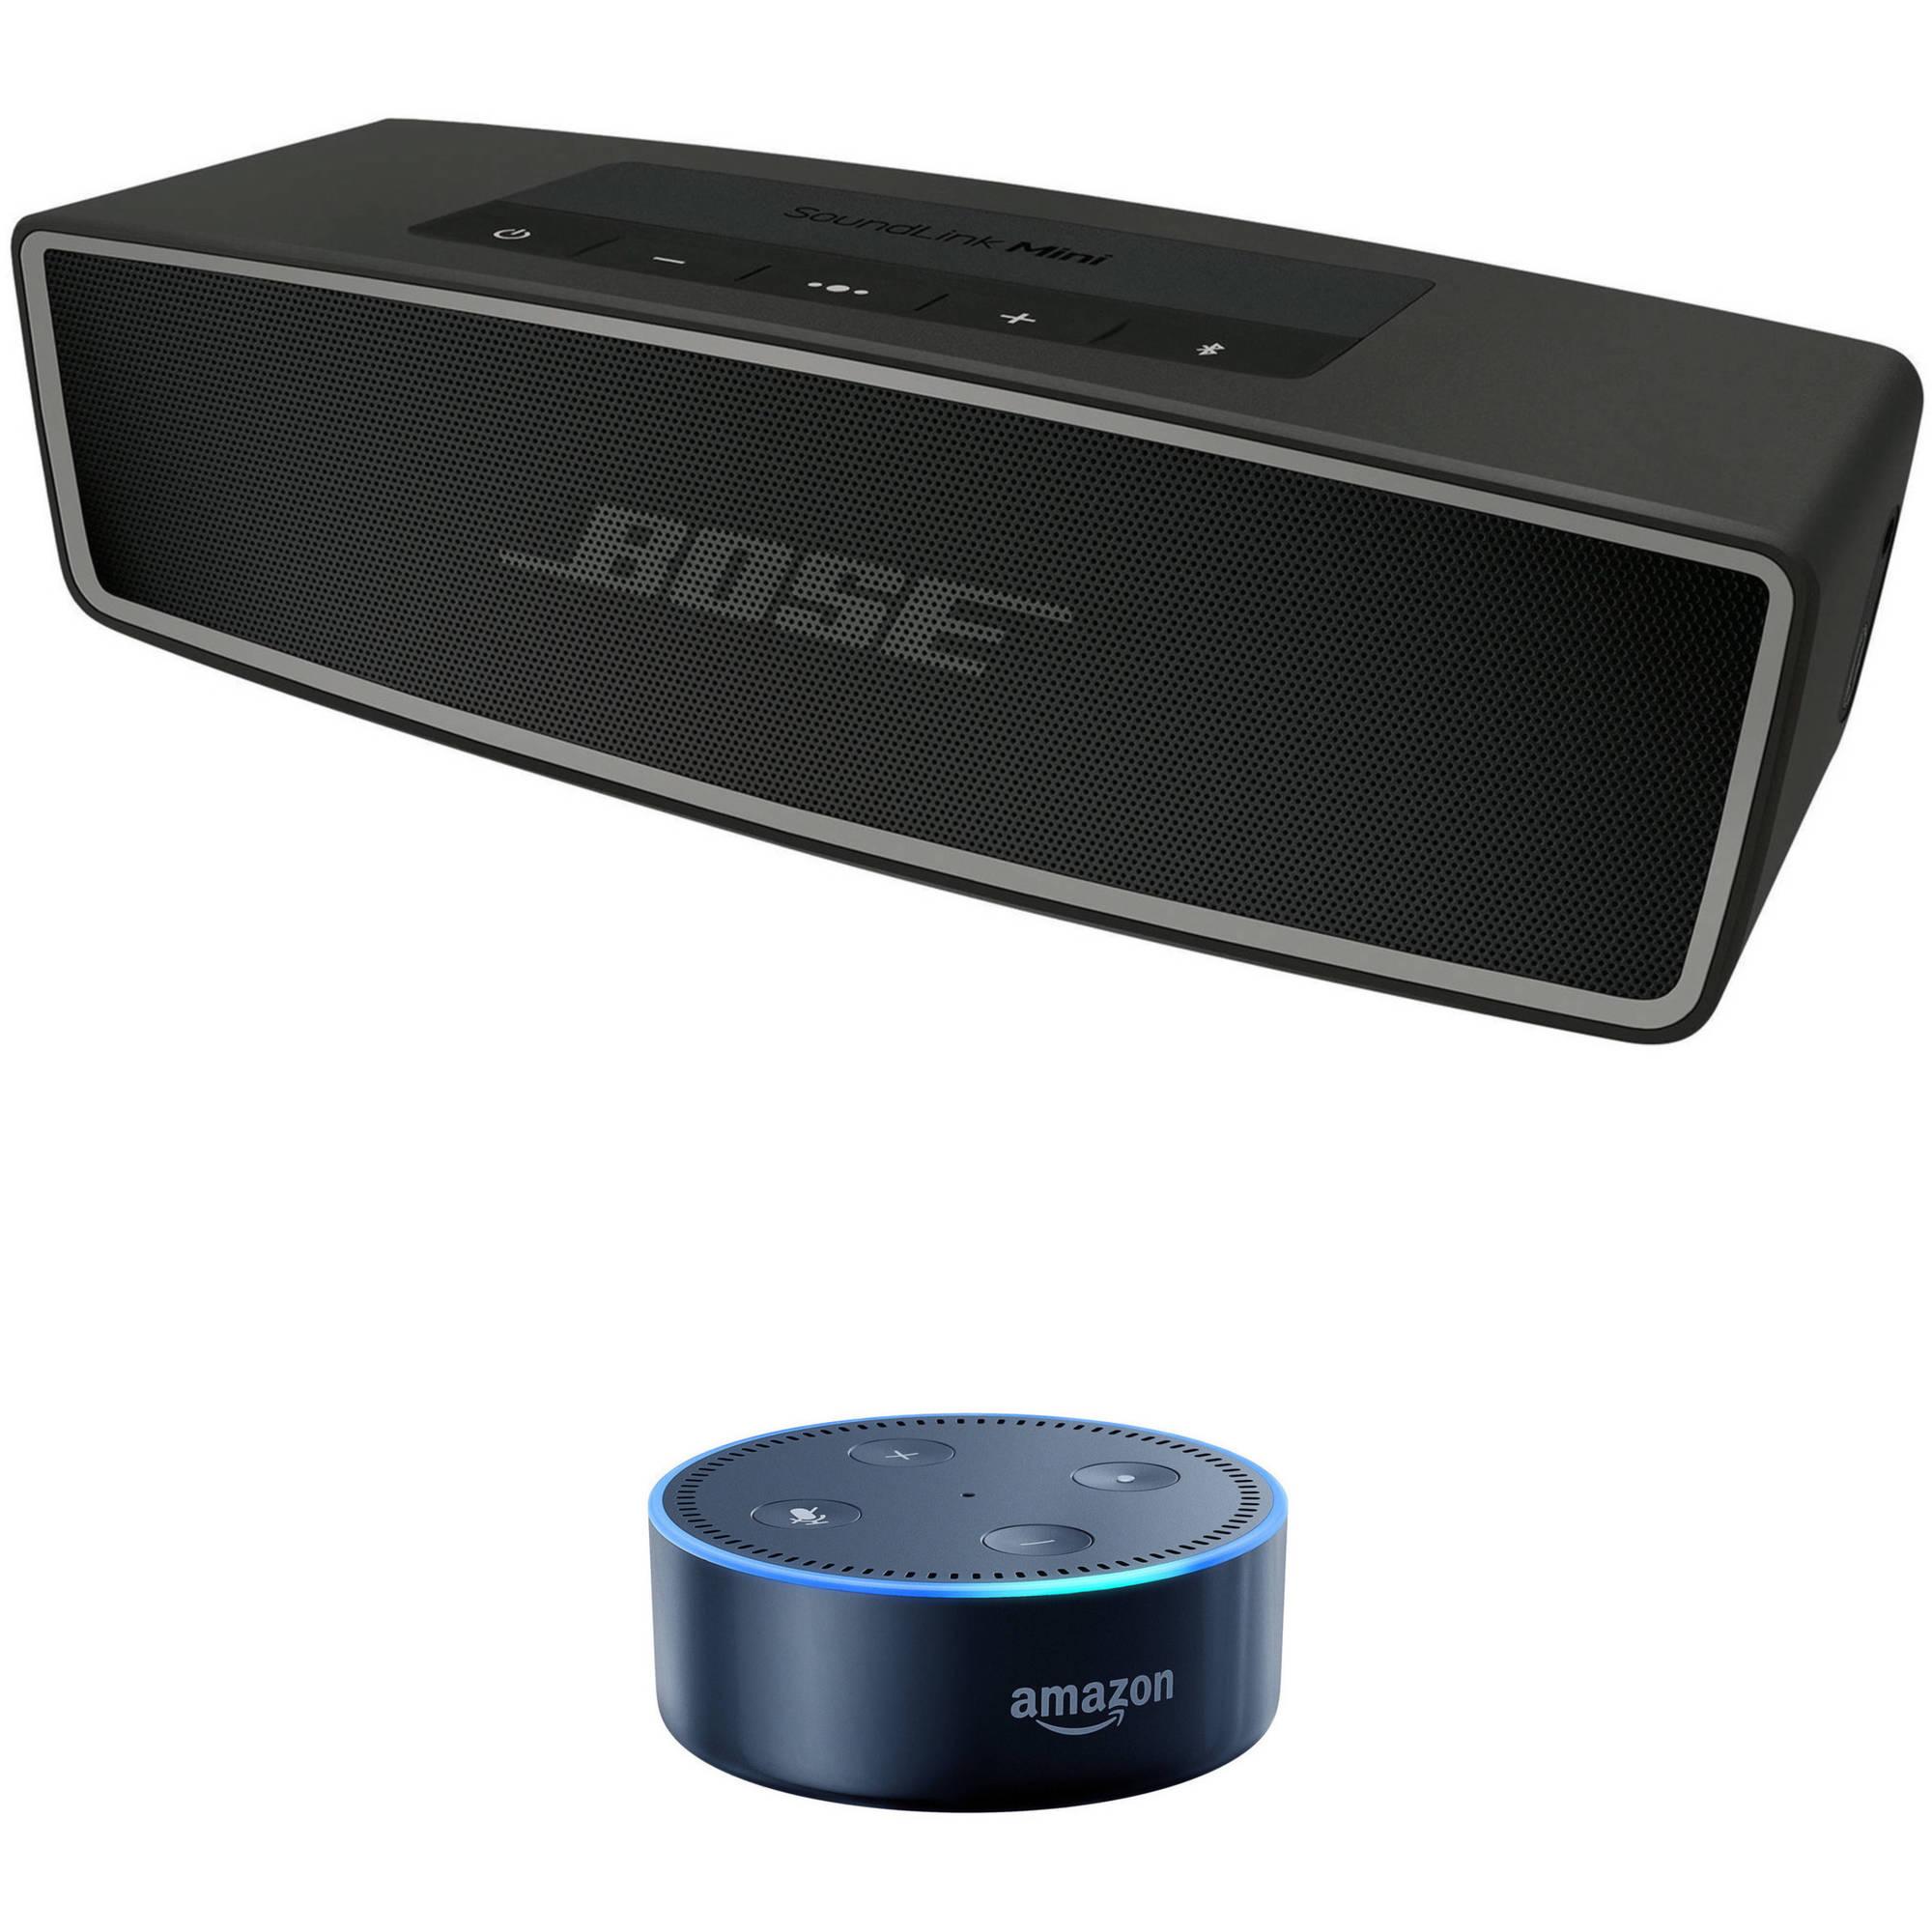 Bose SoundLink Mini Bluetooth Speaker II (Carbon) with Amazon